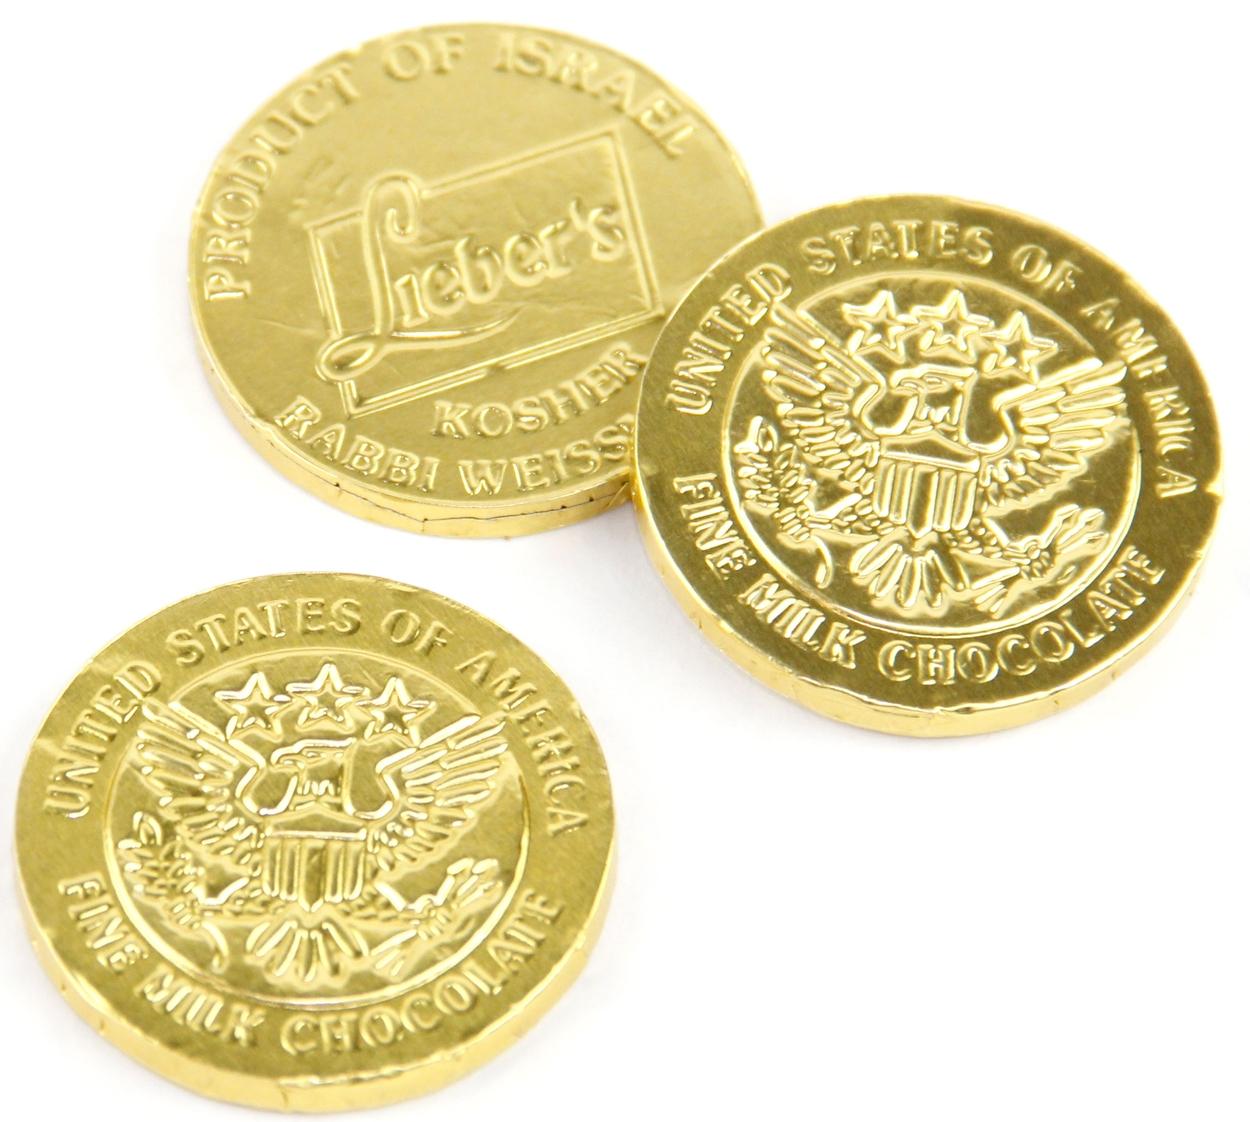 Passover Milk Chocolate Coins - 2 oz • Passover Chocolate ...